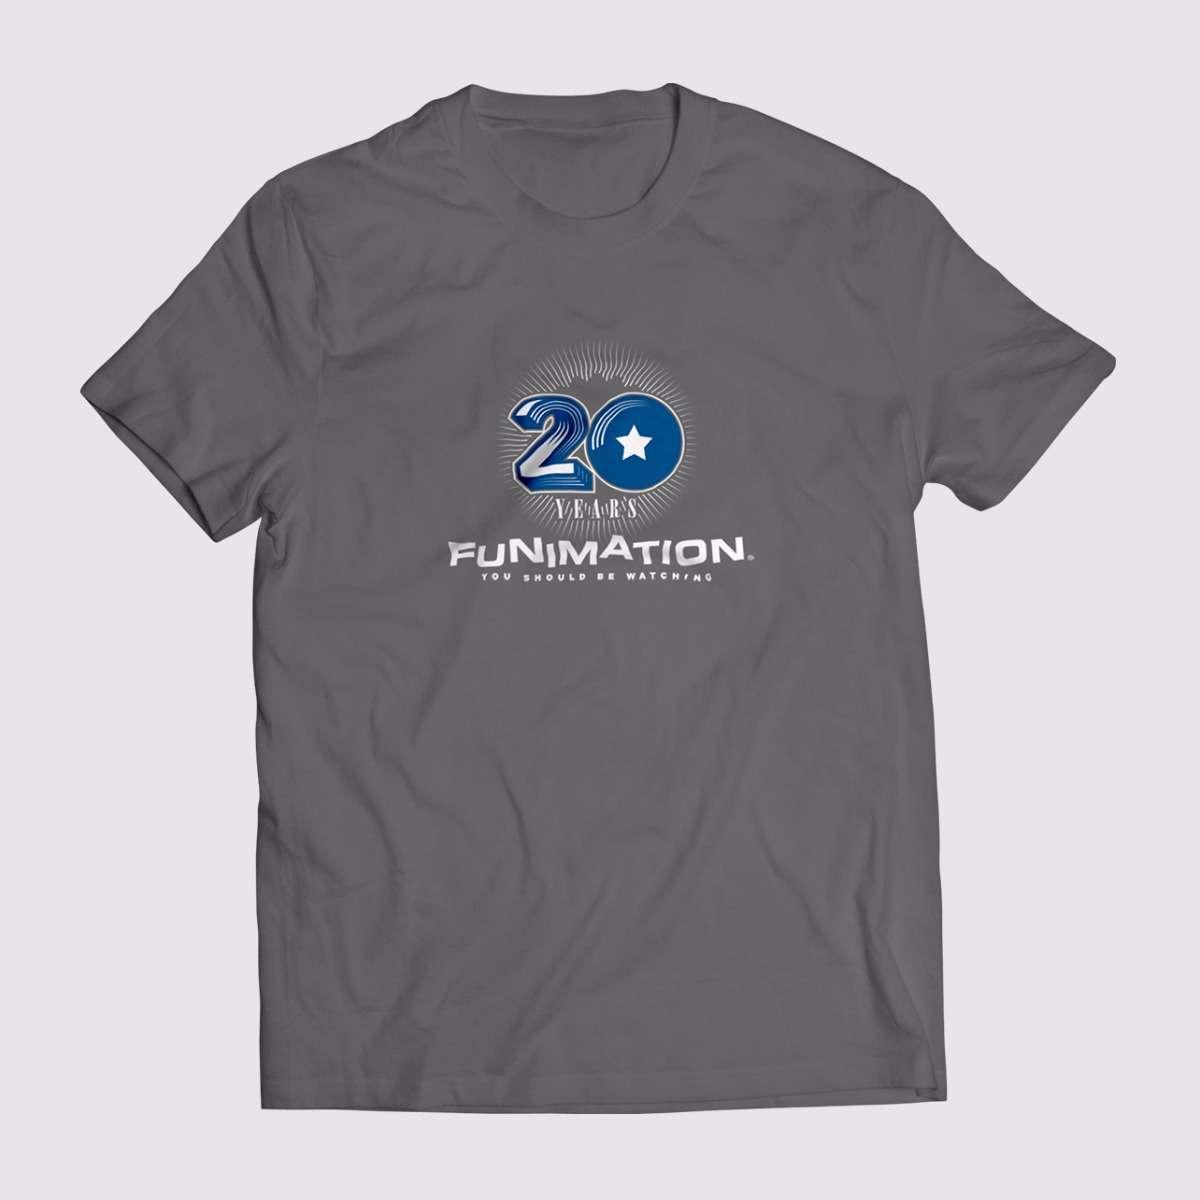 20th Anniversary T-Shirt apparel